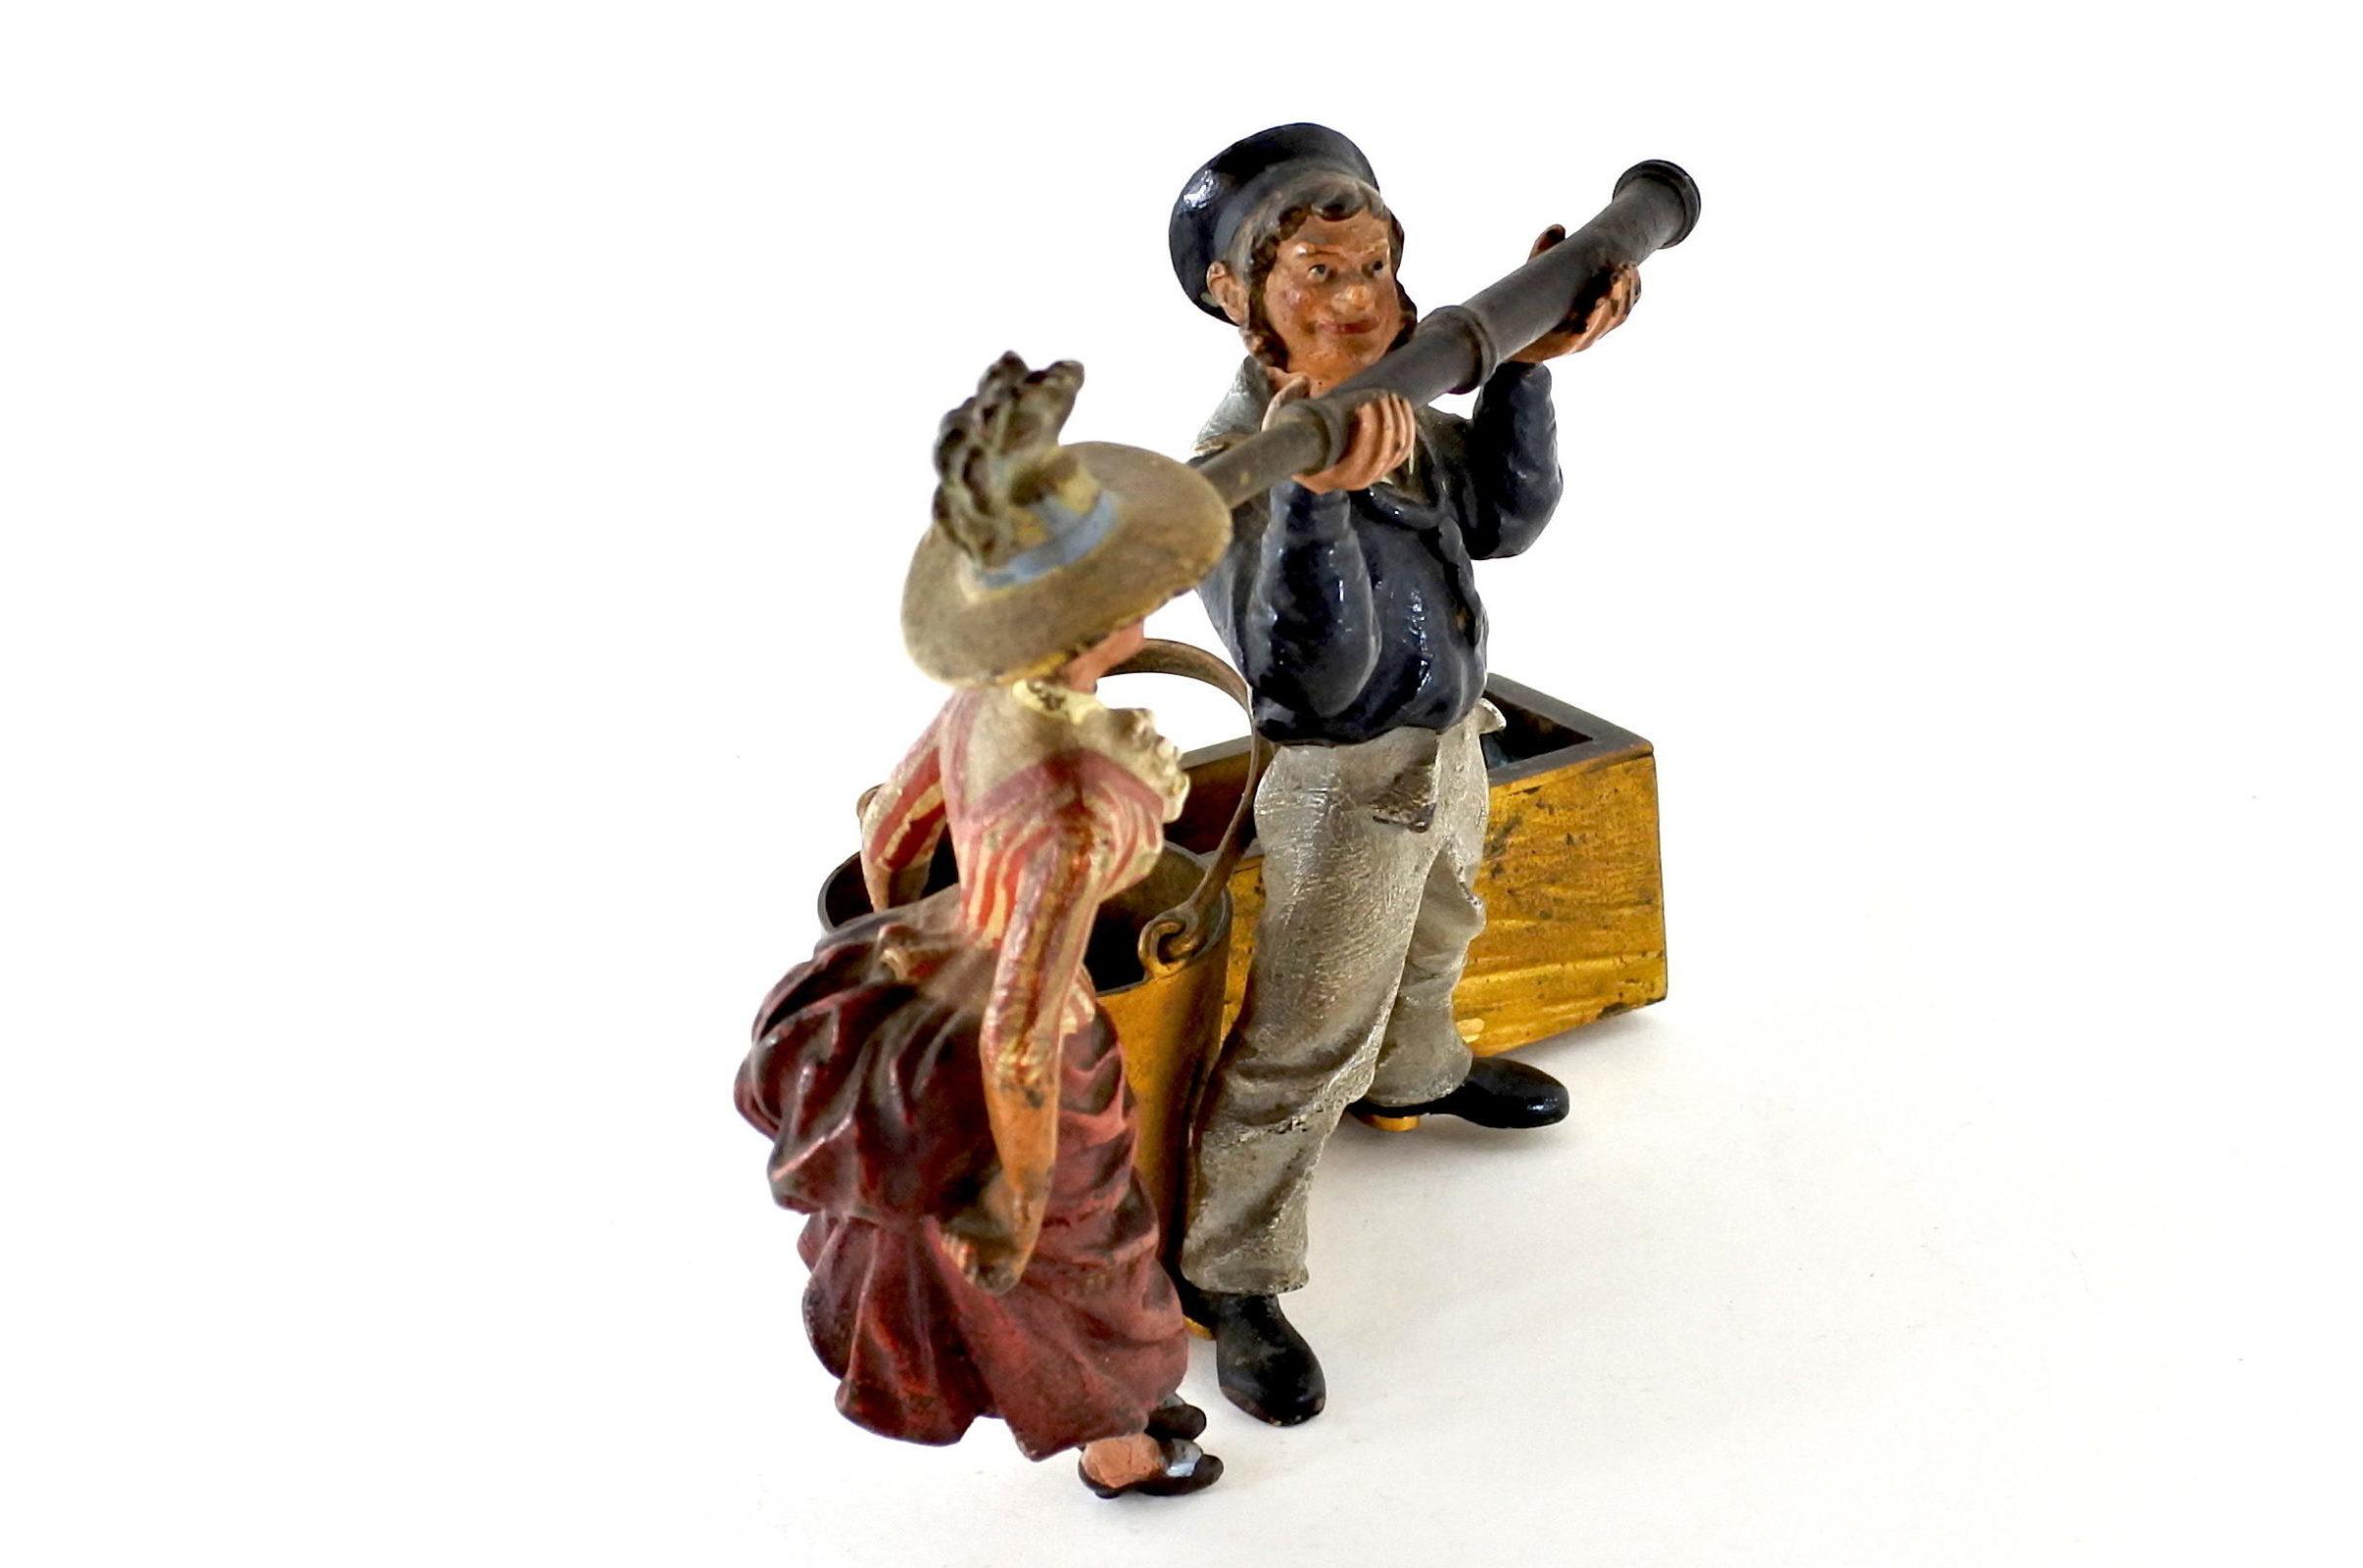 Bronzo di Vienna policromo - Donna con cannocchiale e marinaio - 2